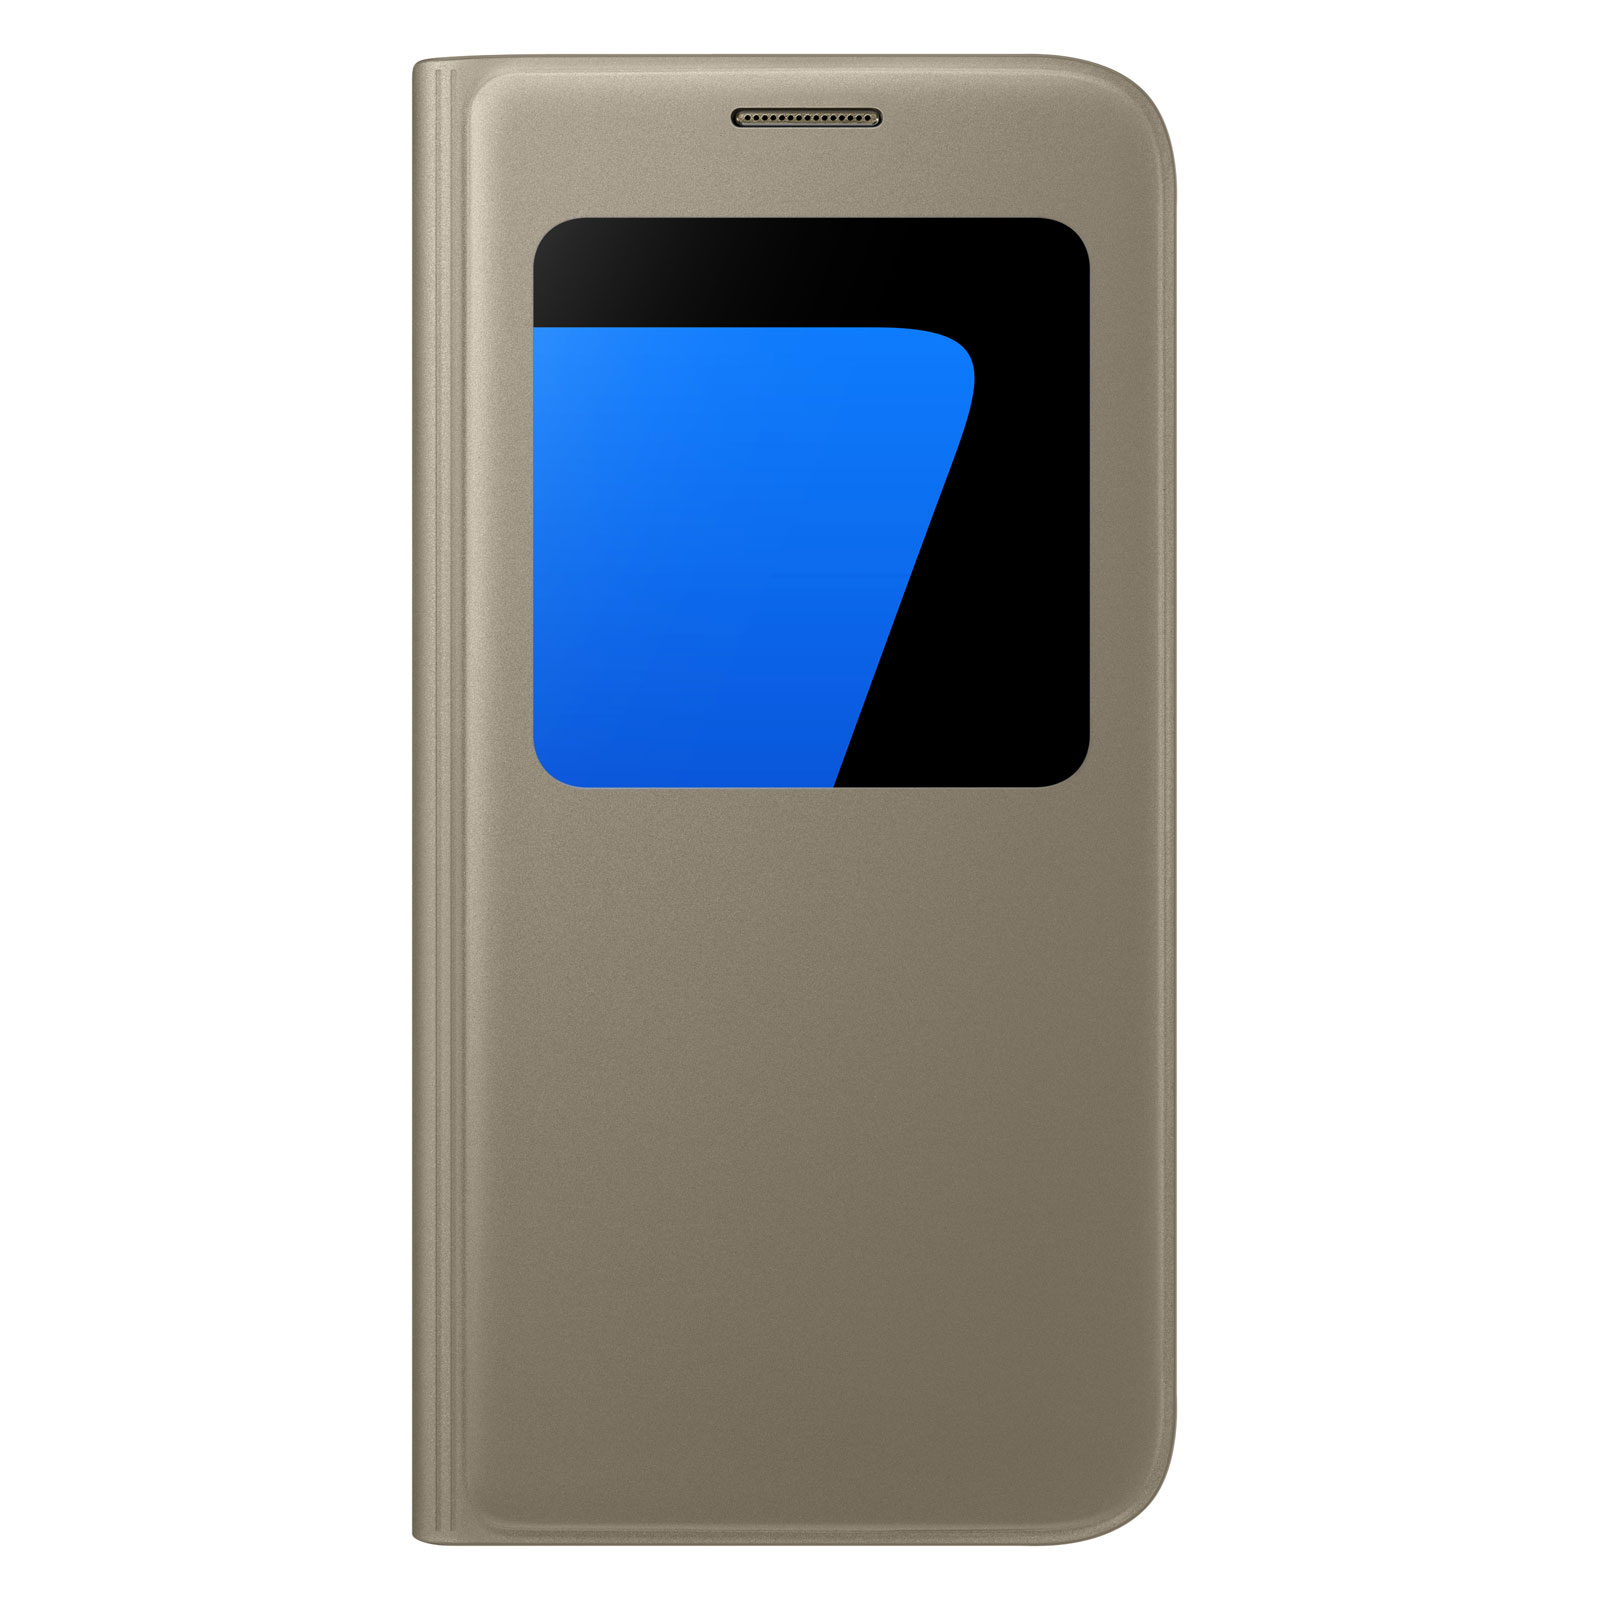 Etui téléphone Samsung S-View Or Samsung Galaxy S7 Etui folio pour Samsung  Galaxy S7 8fd0ad7ce8c1